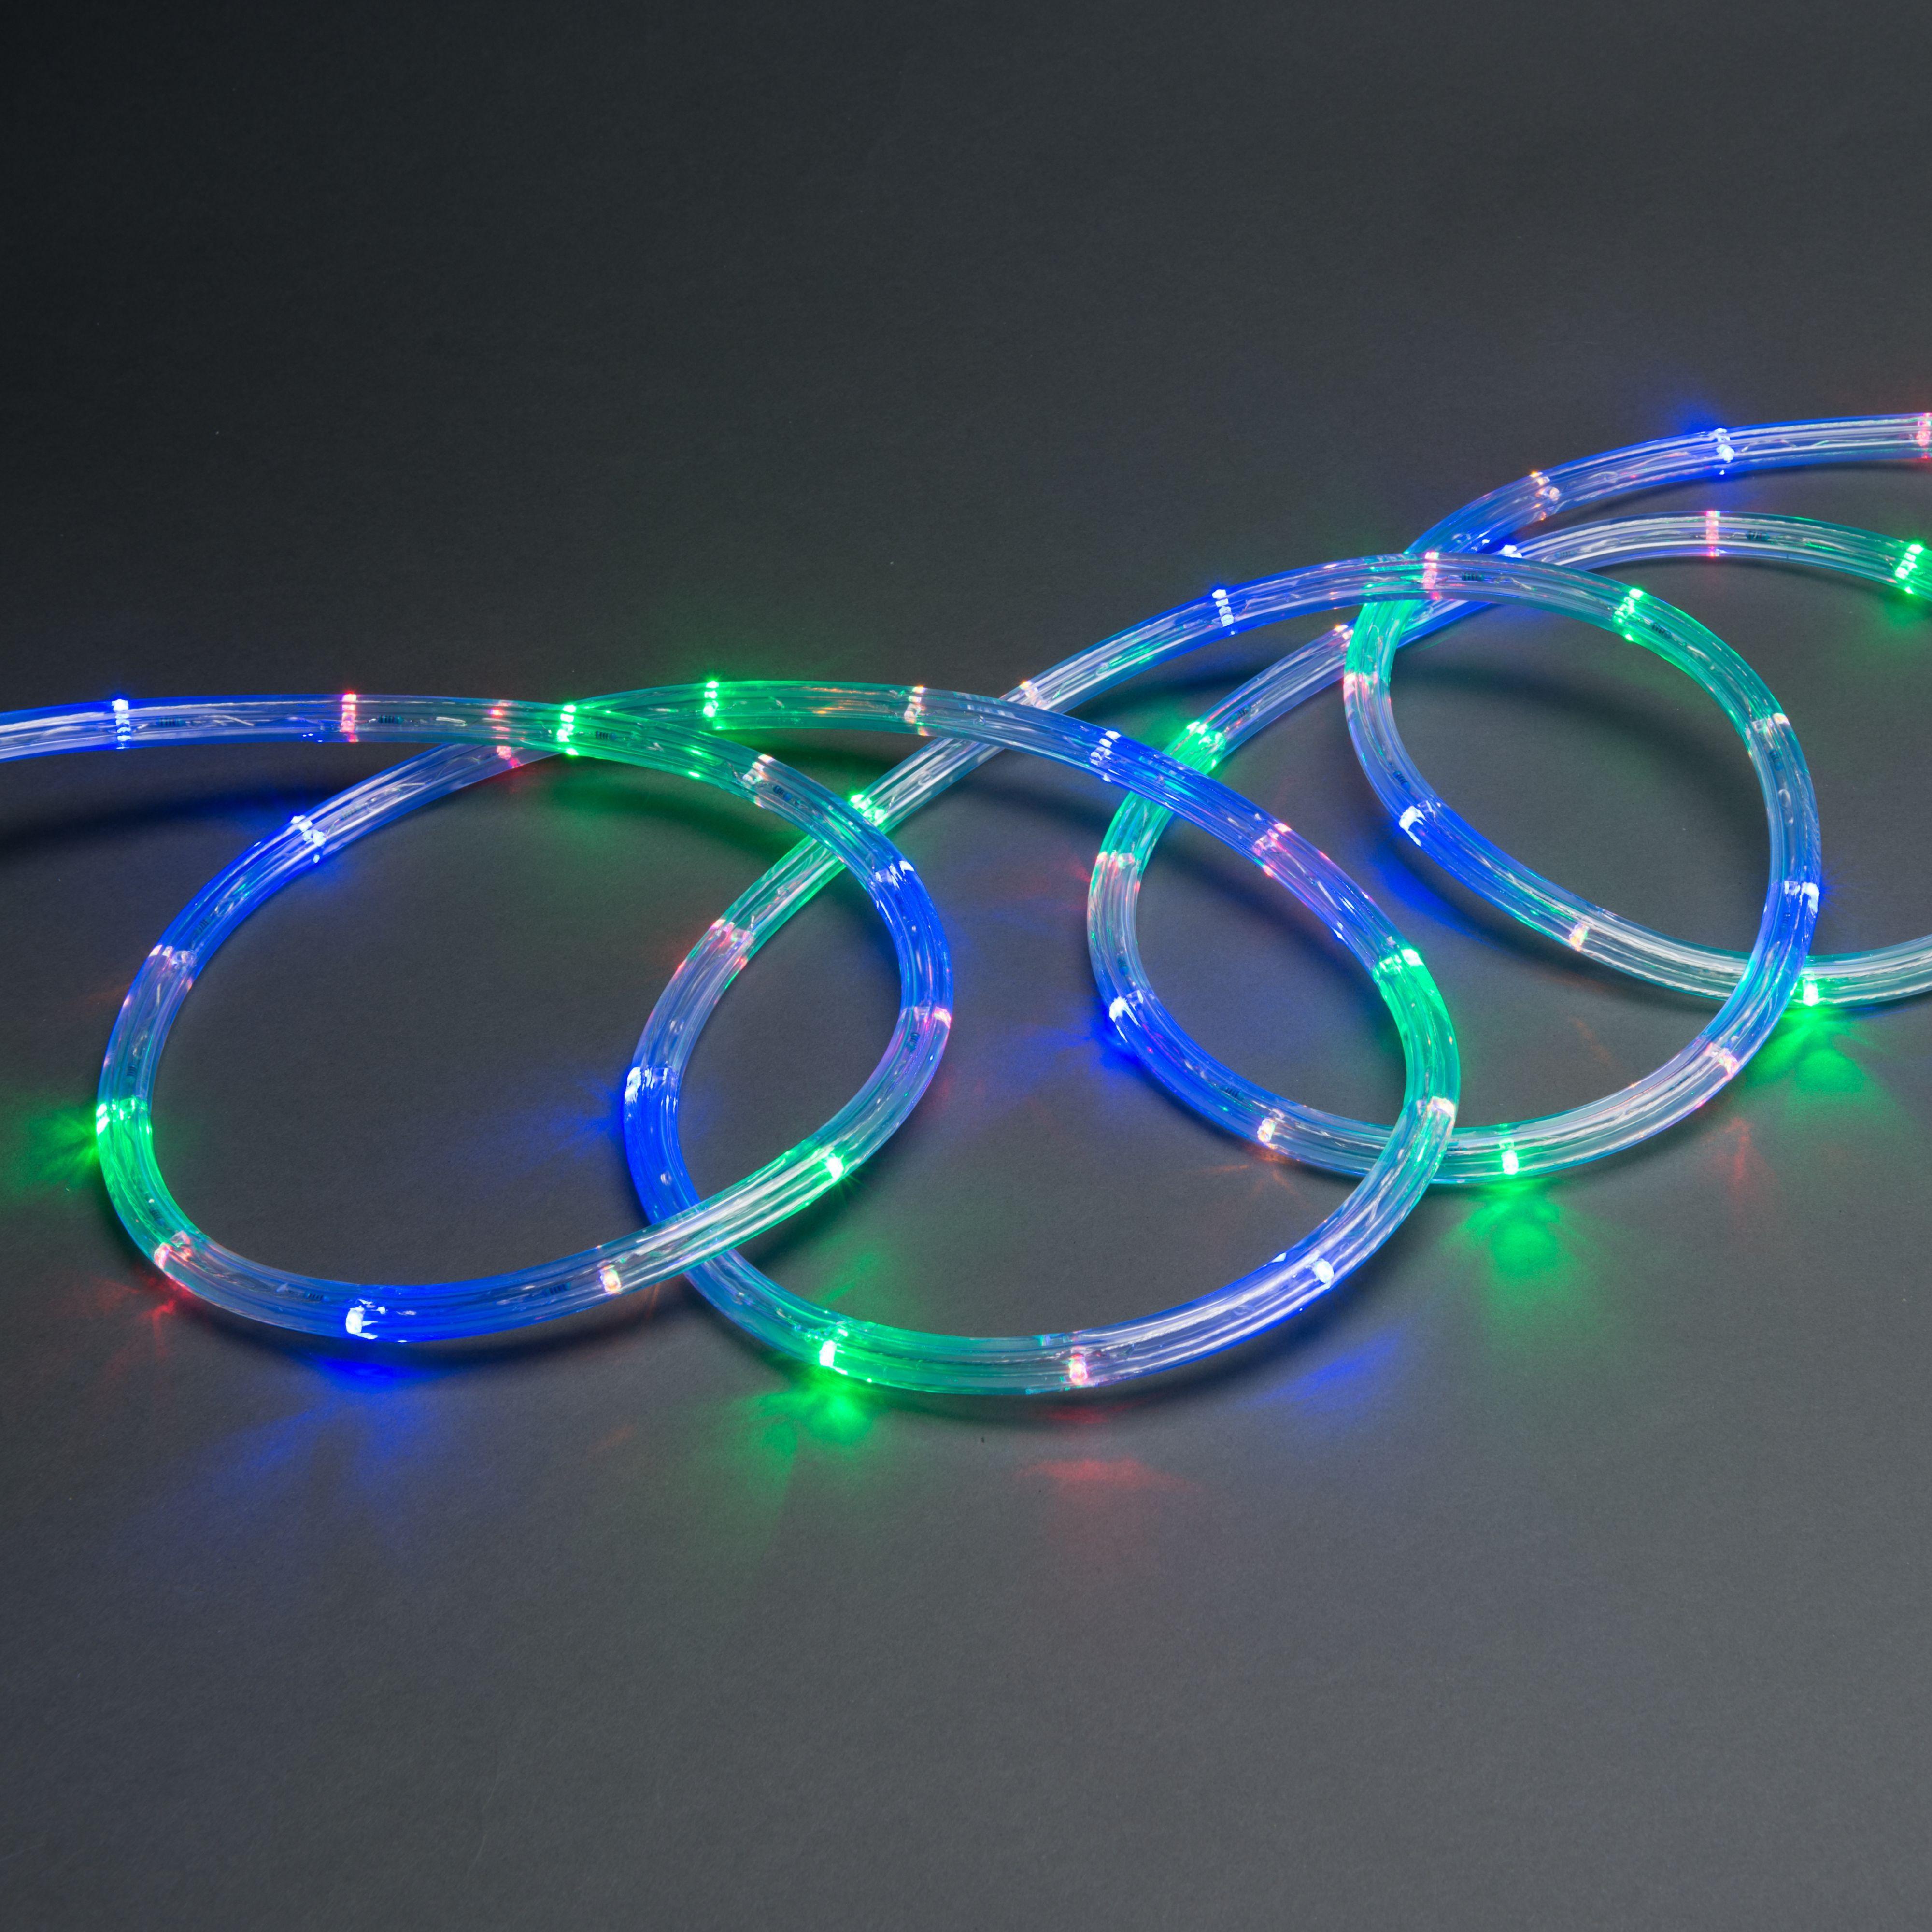 Multicolour LED Rope Light Departments DIY at B&Q